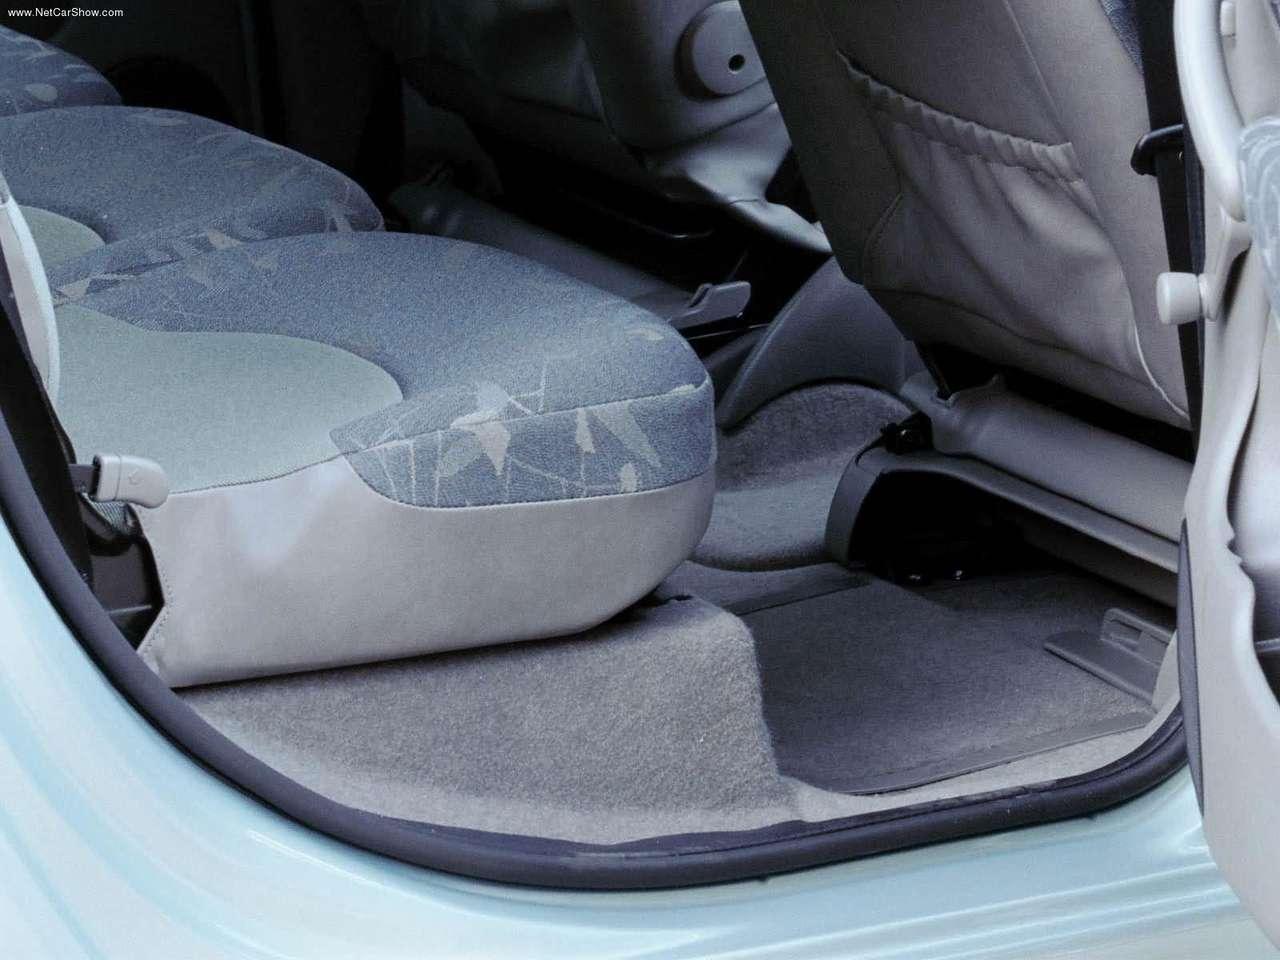 Xsara Picasso 1999 siège arrière